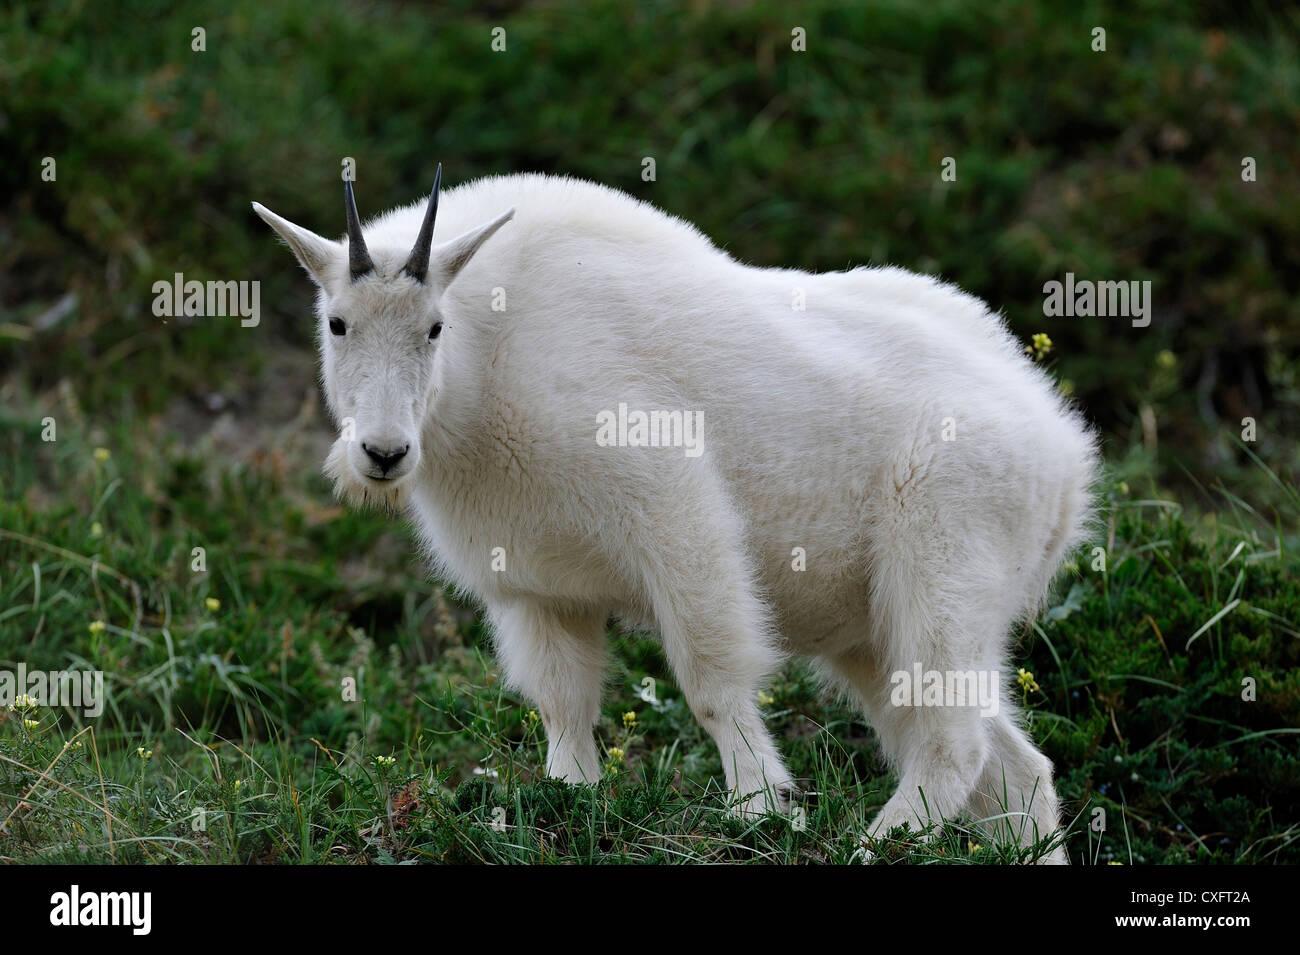 A white mountain goat' Oreamnos americanus' standing in mountain vegetation - Stock Image